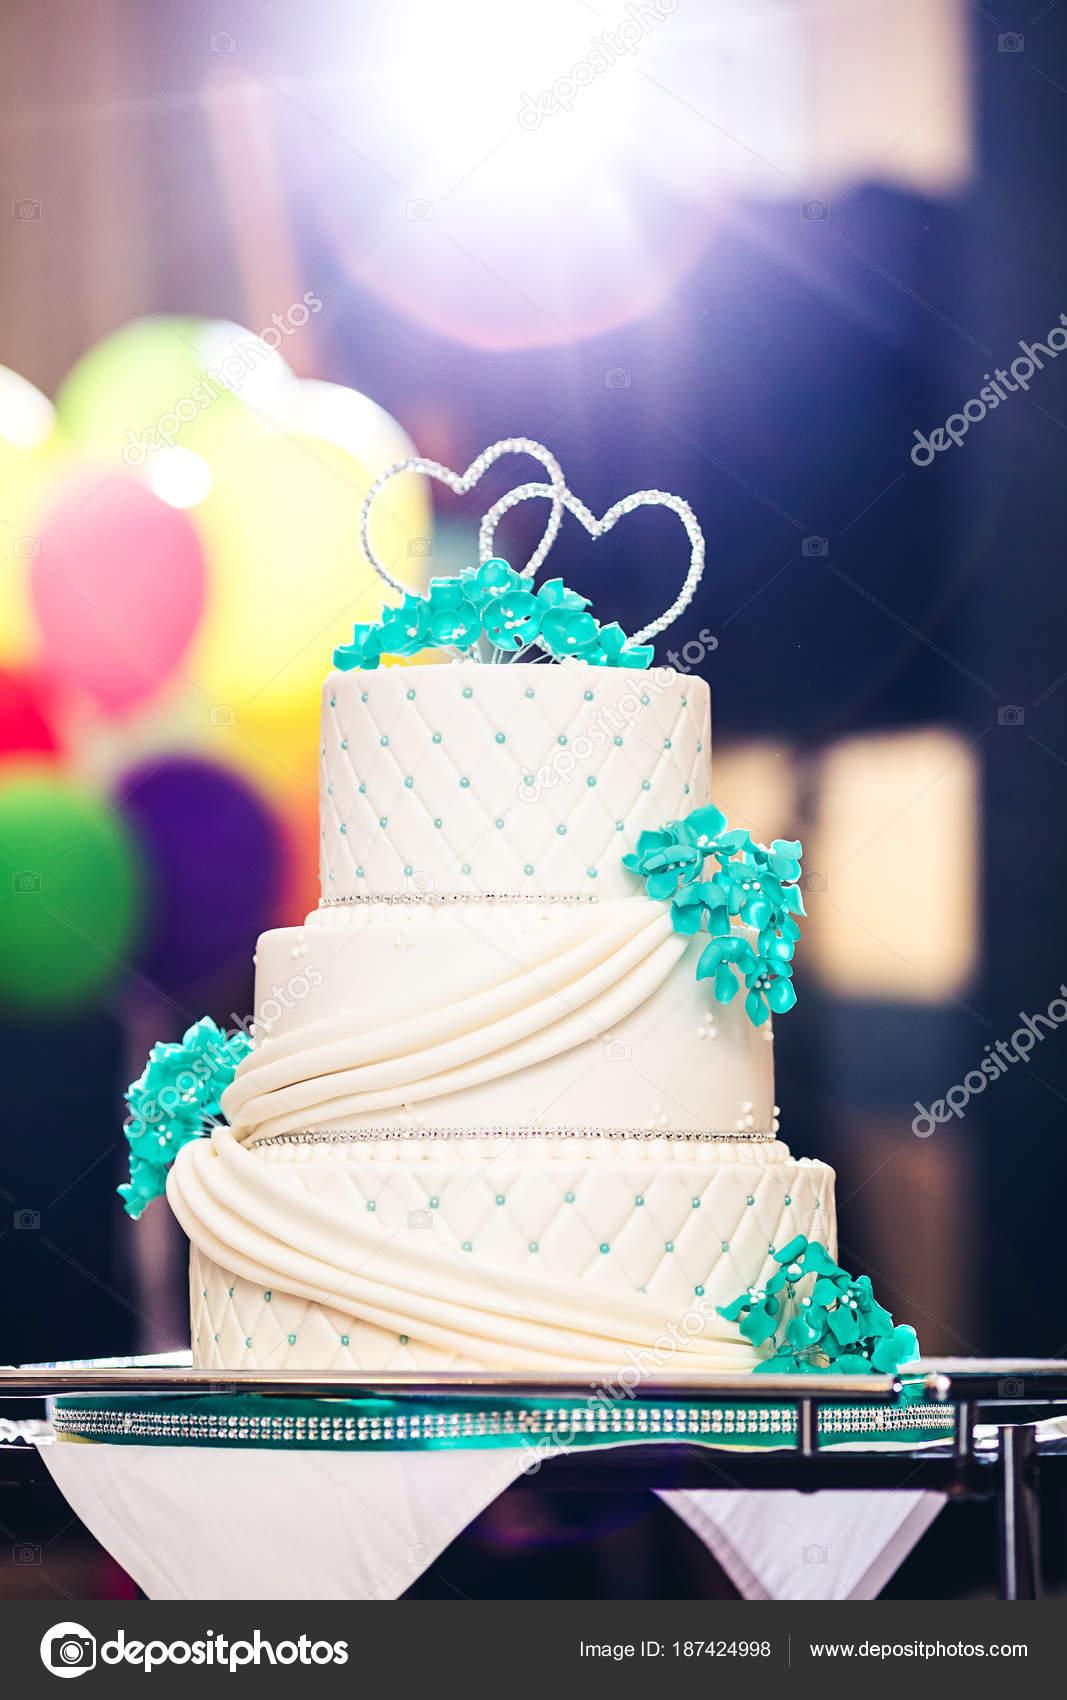 Una bella torta nuziale decorata con fiori blu, strass e cuori.  Retroilluminazione \u2014 Foto